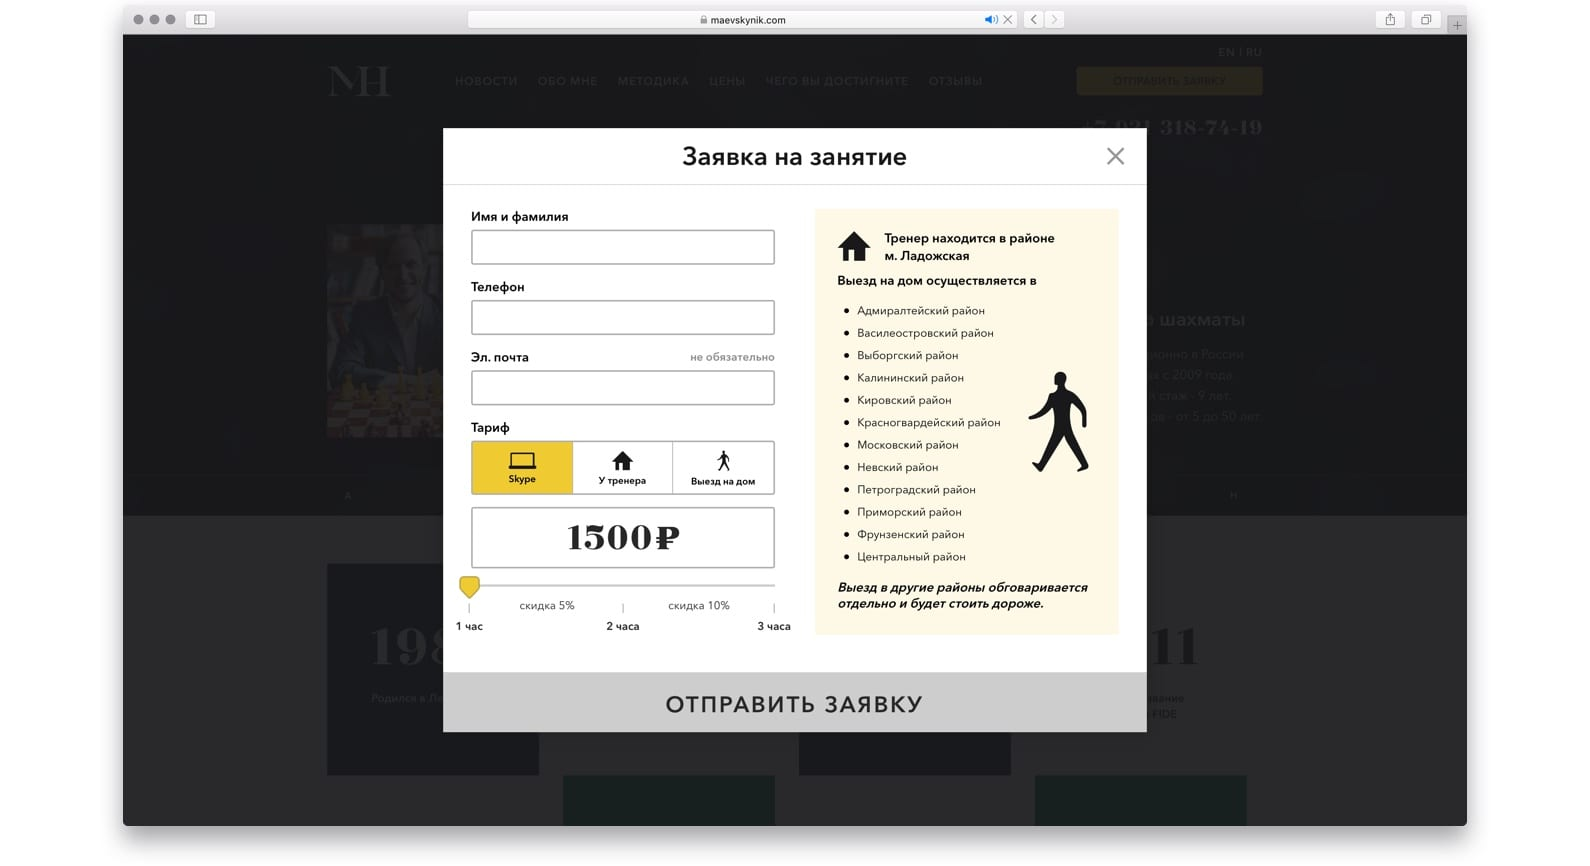 maevsky/i/screen-2